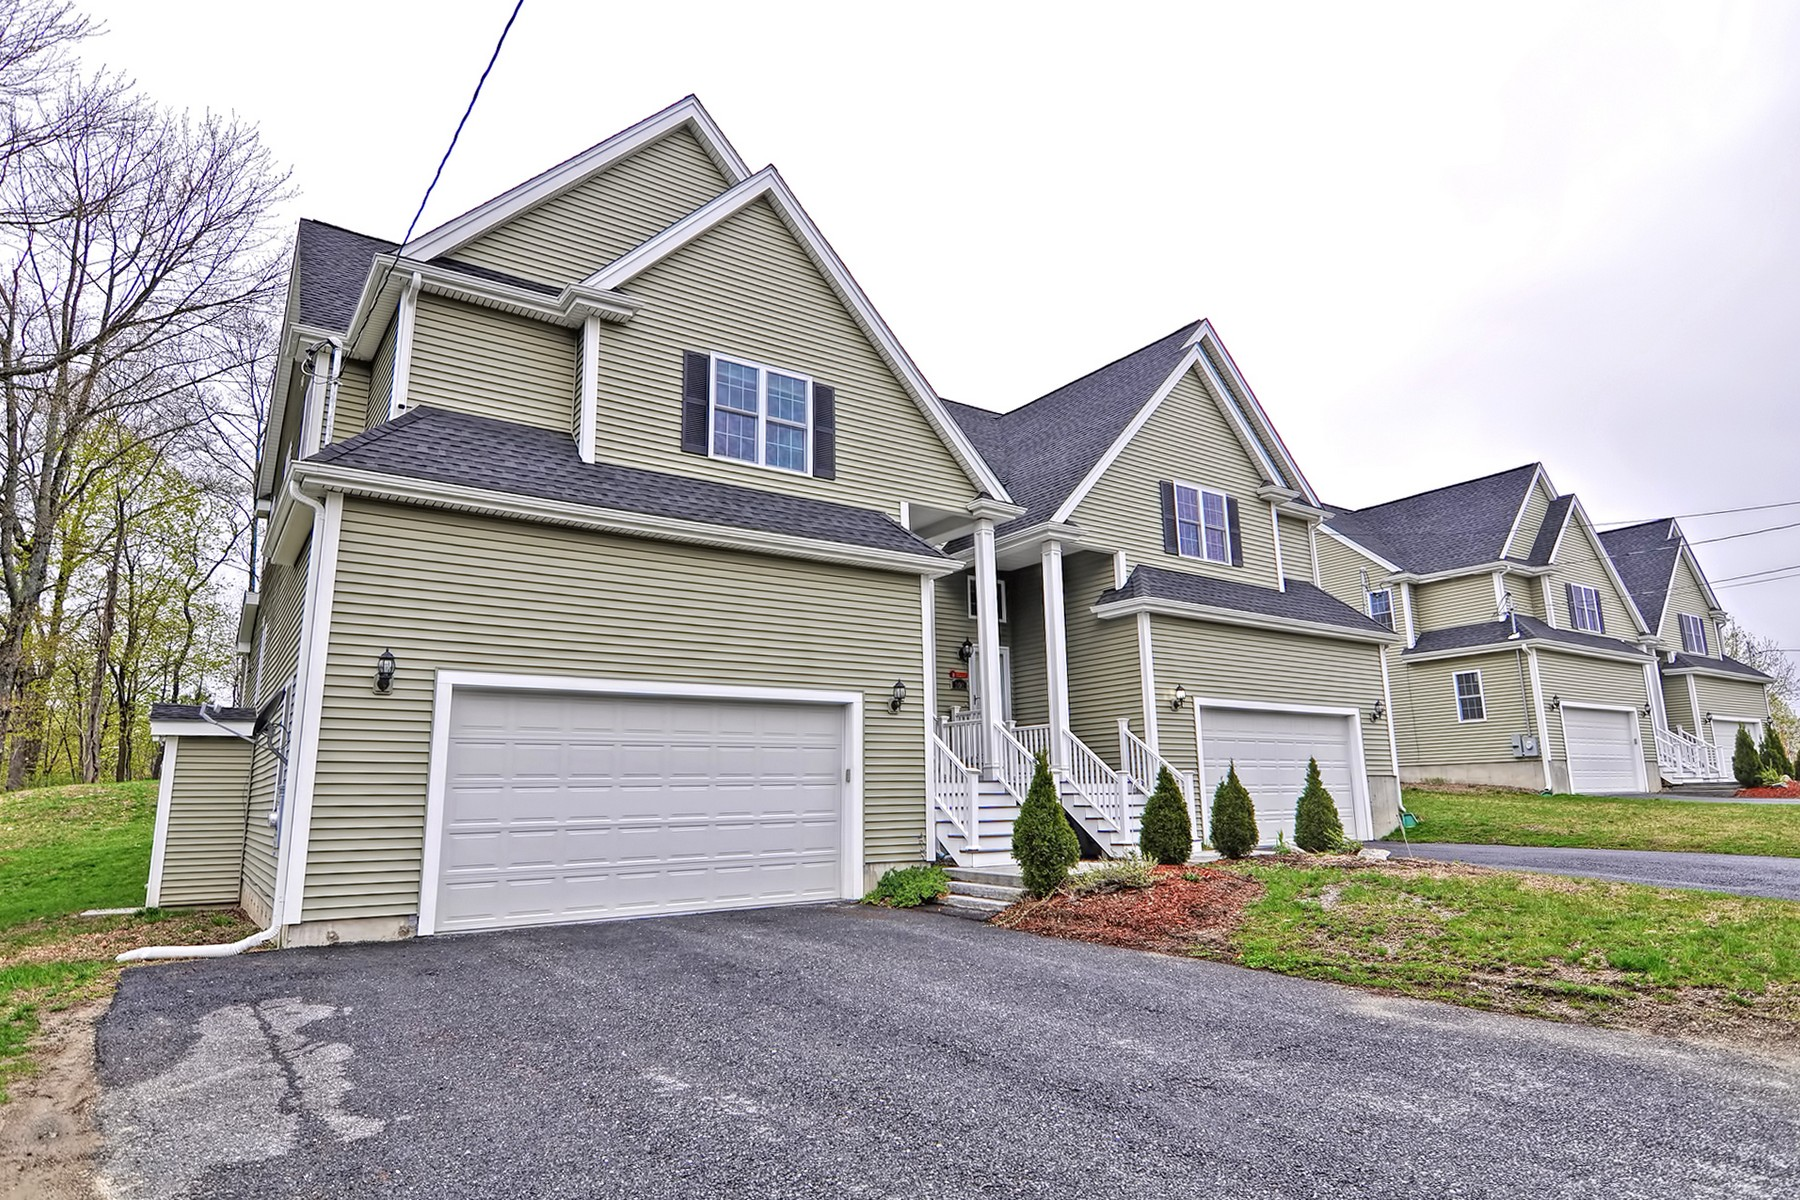 Single Family Homes for Active at Beautiful Newer Construction Duplex 99 Elm Street - Unit 99 Shrewsbury, Massachusetts 01545 United States